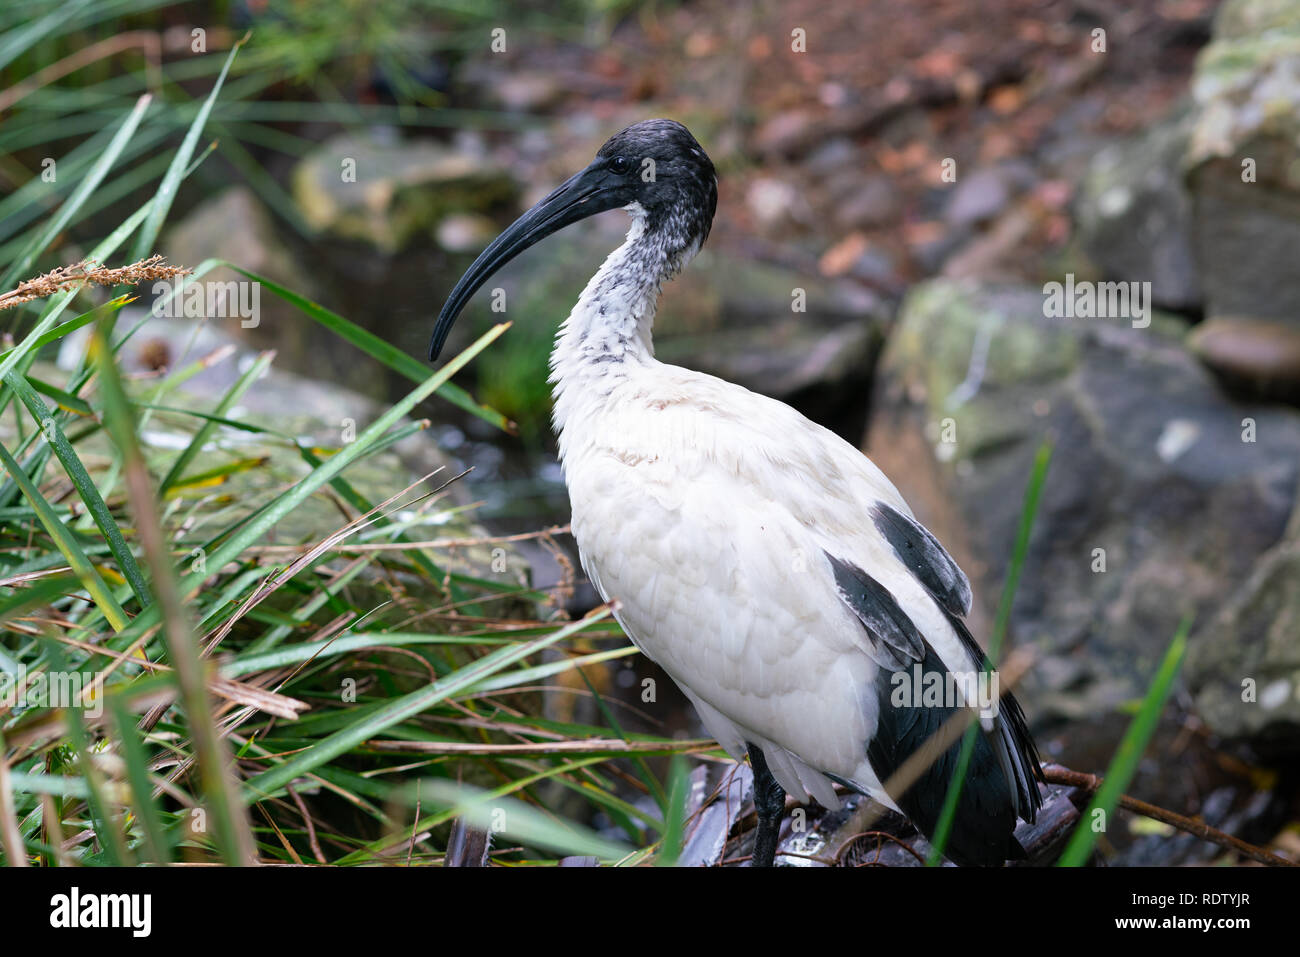 Wild Australian white ibis or Threskiornis molucca bird in a park in Sydney NSW Australia - Stock Image